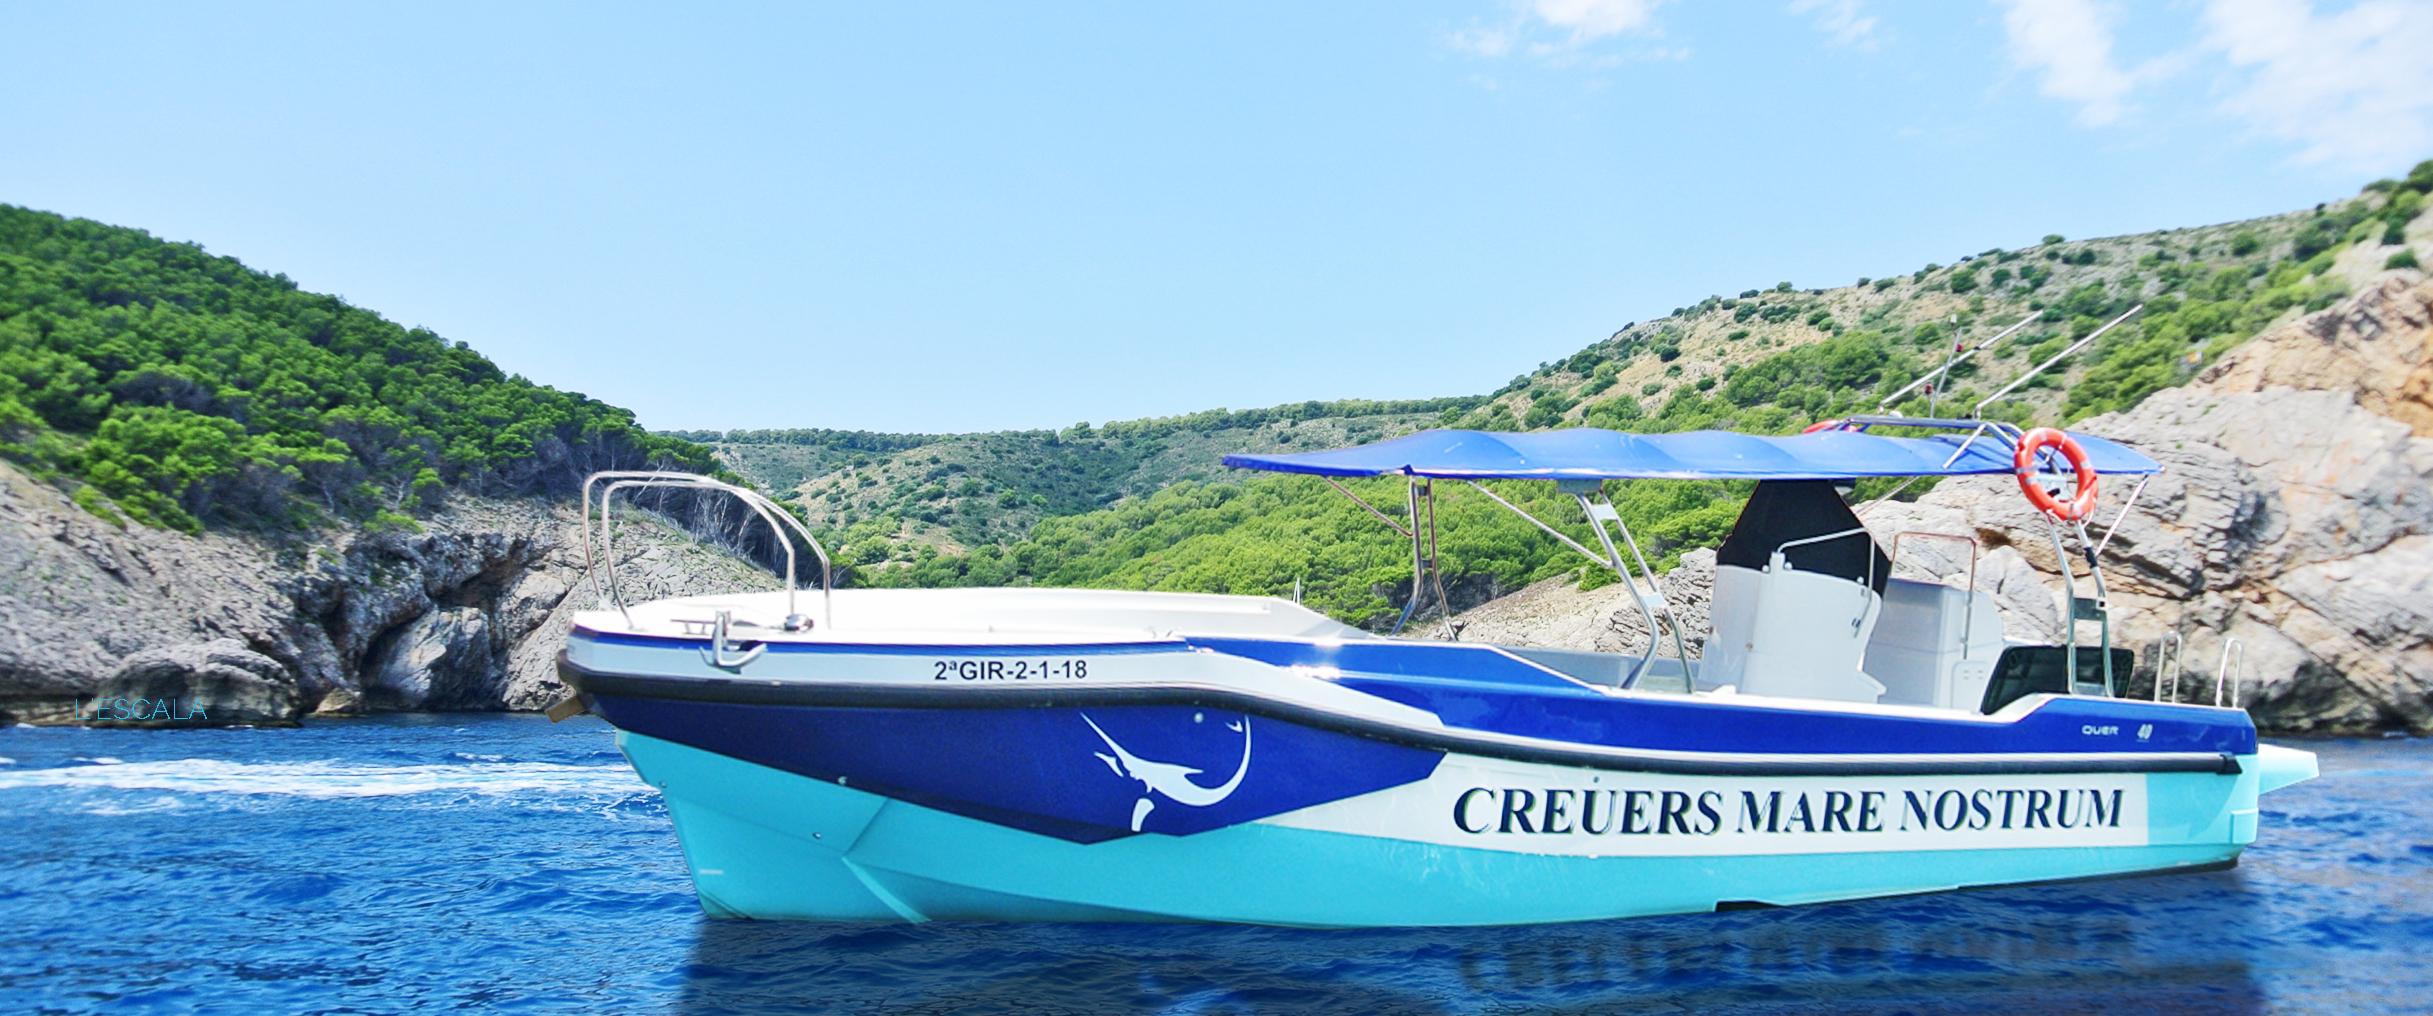 Stella Maris - Creuers Mare Nostrum - Actividades Nauticas - Lescala - Empordaturisme